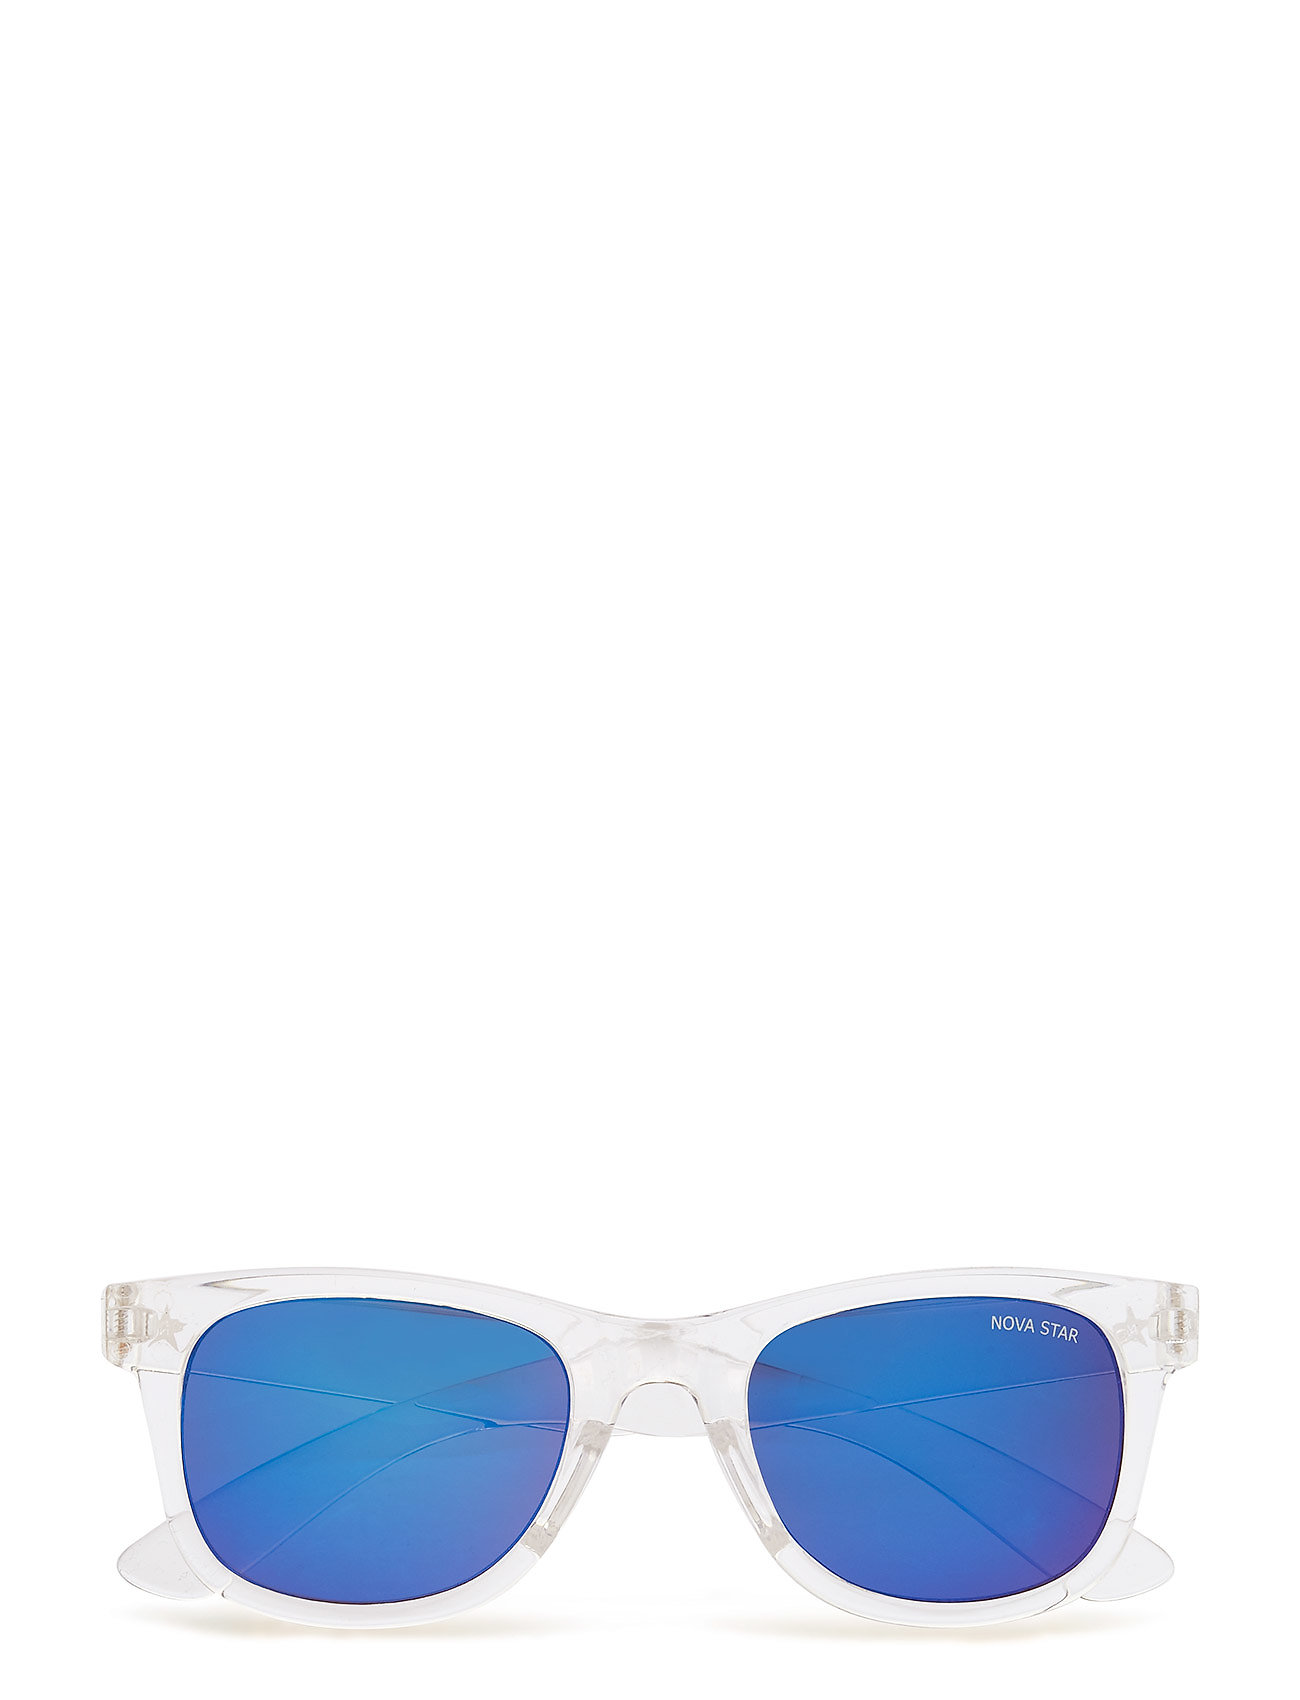 Loui Shiny Clearun NOVA STAR Solbriller til Børn i